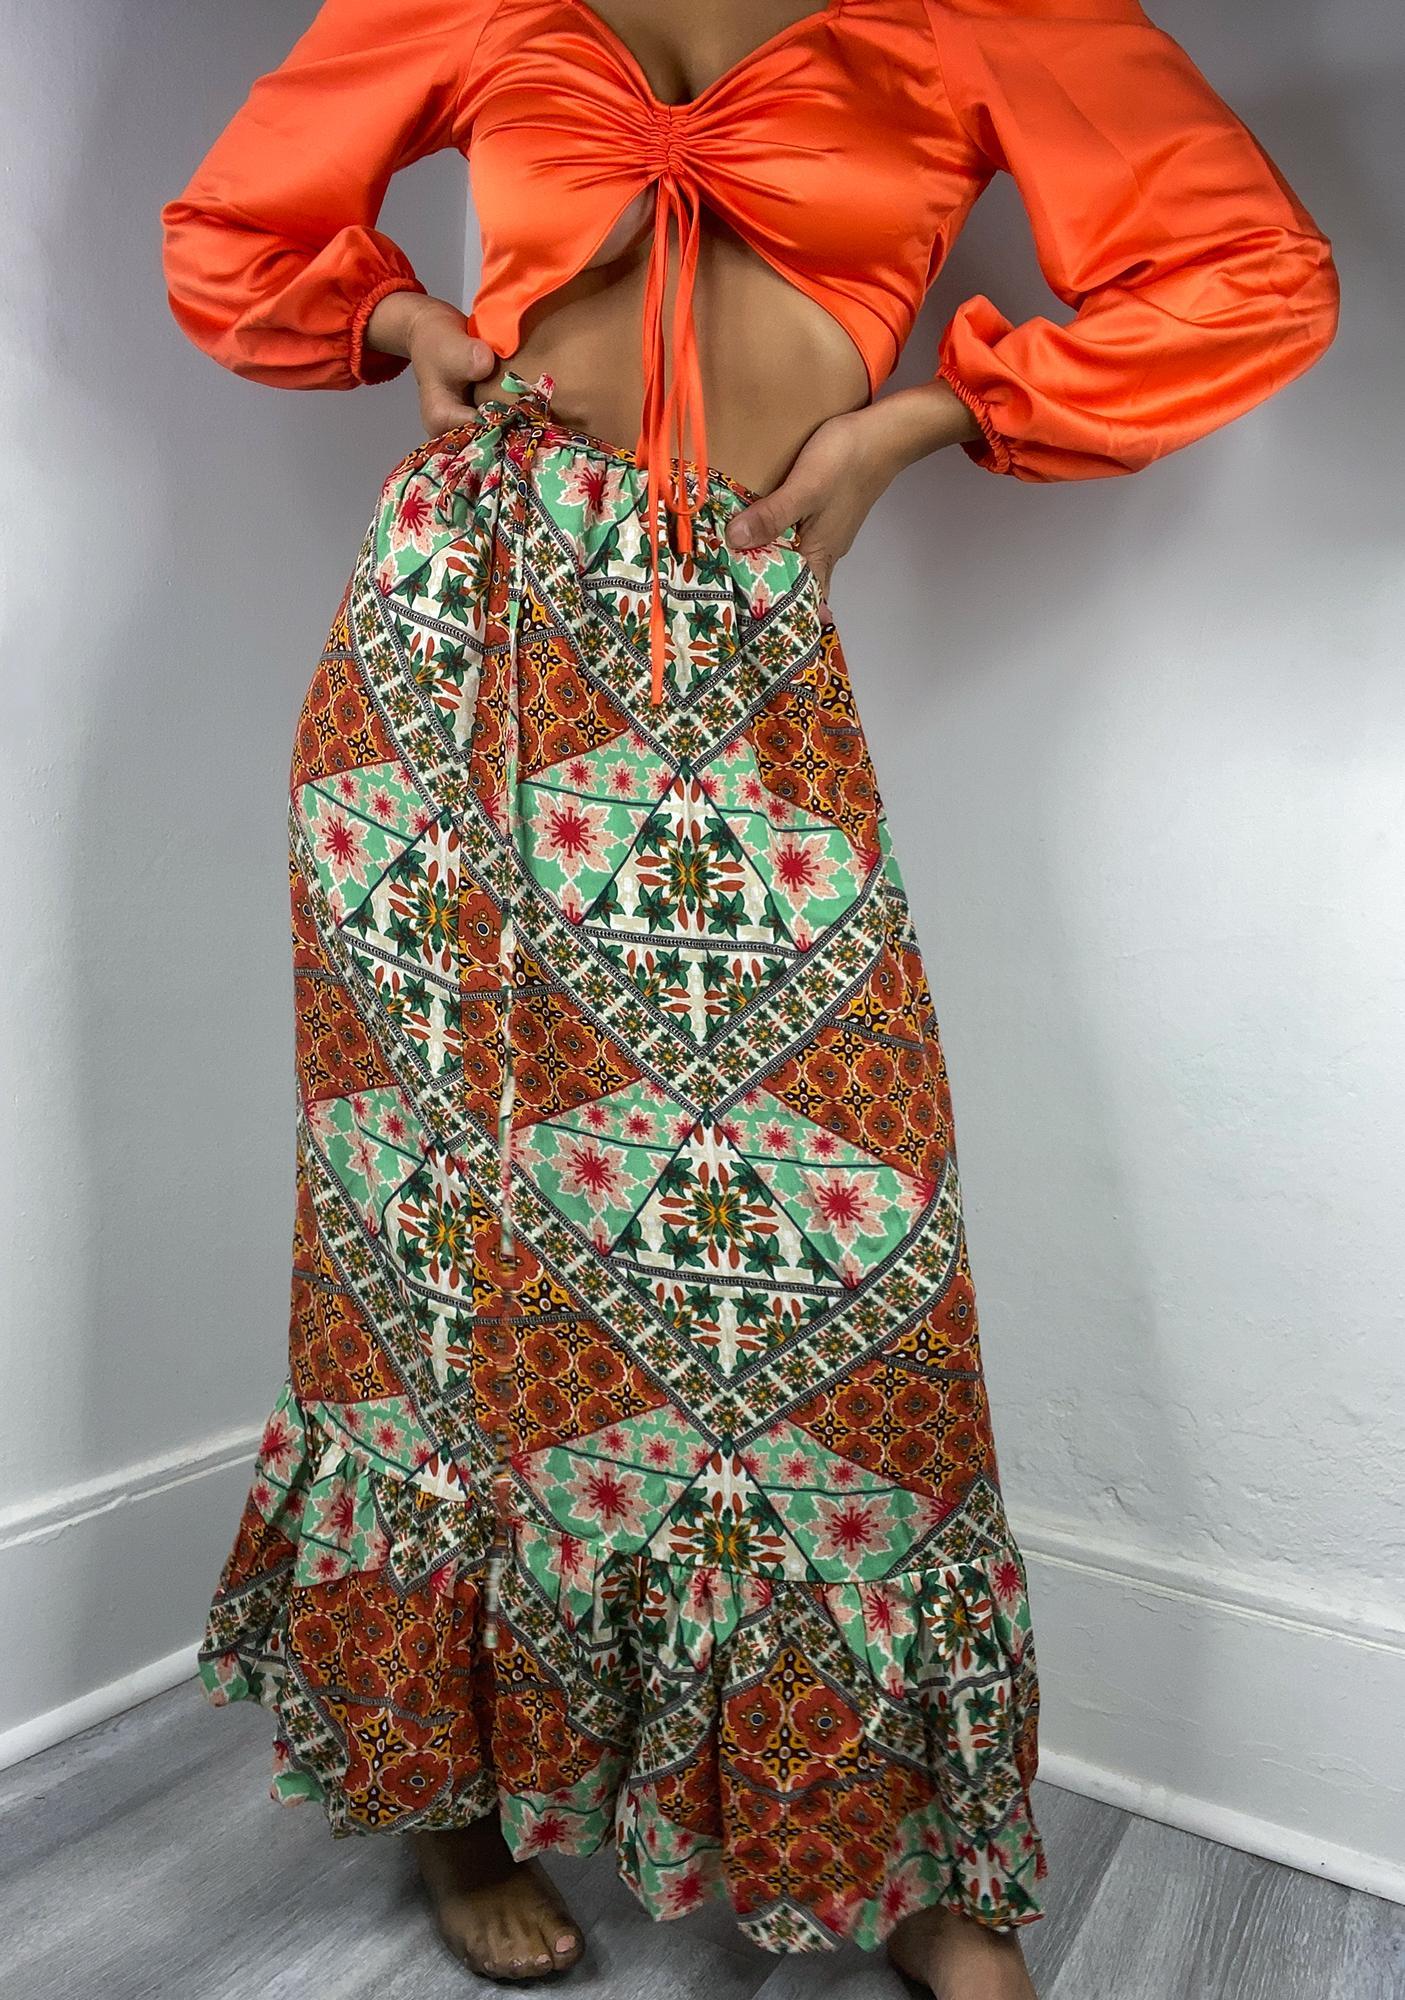 Glamorous Tile Print Maxi Skirt